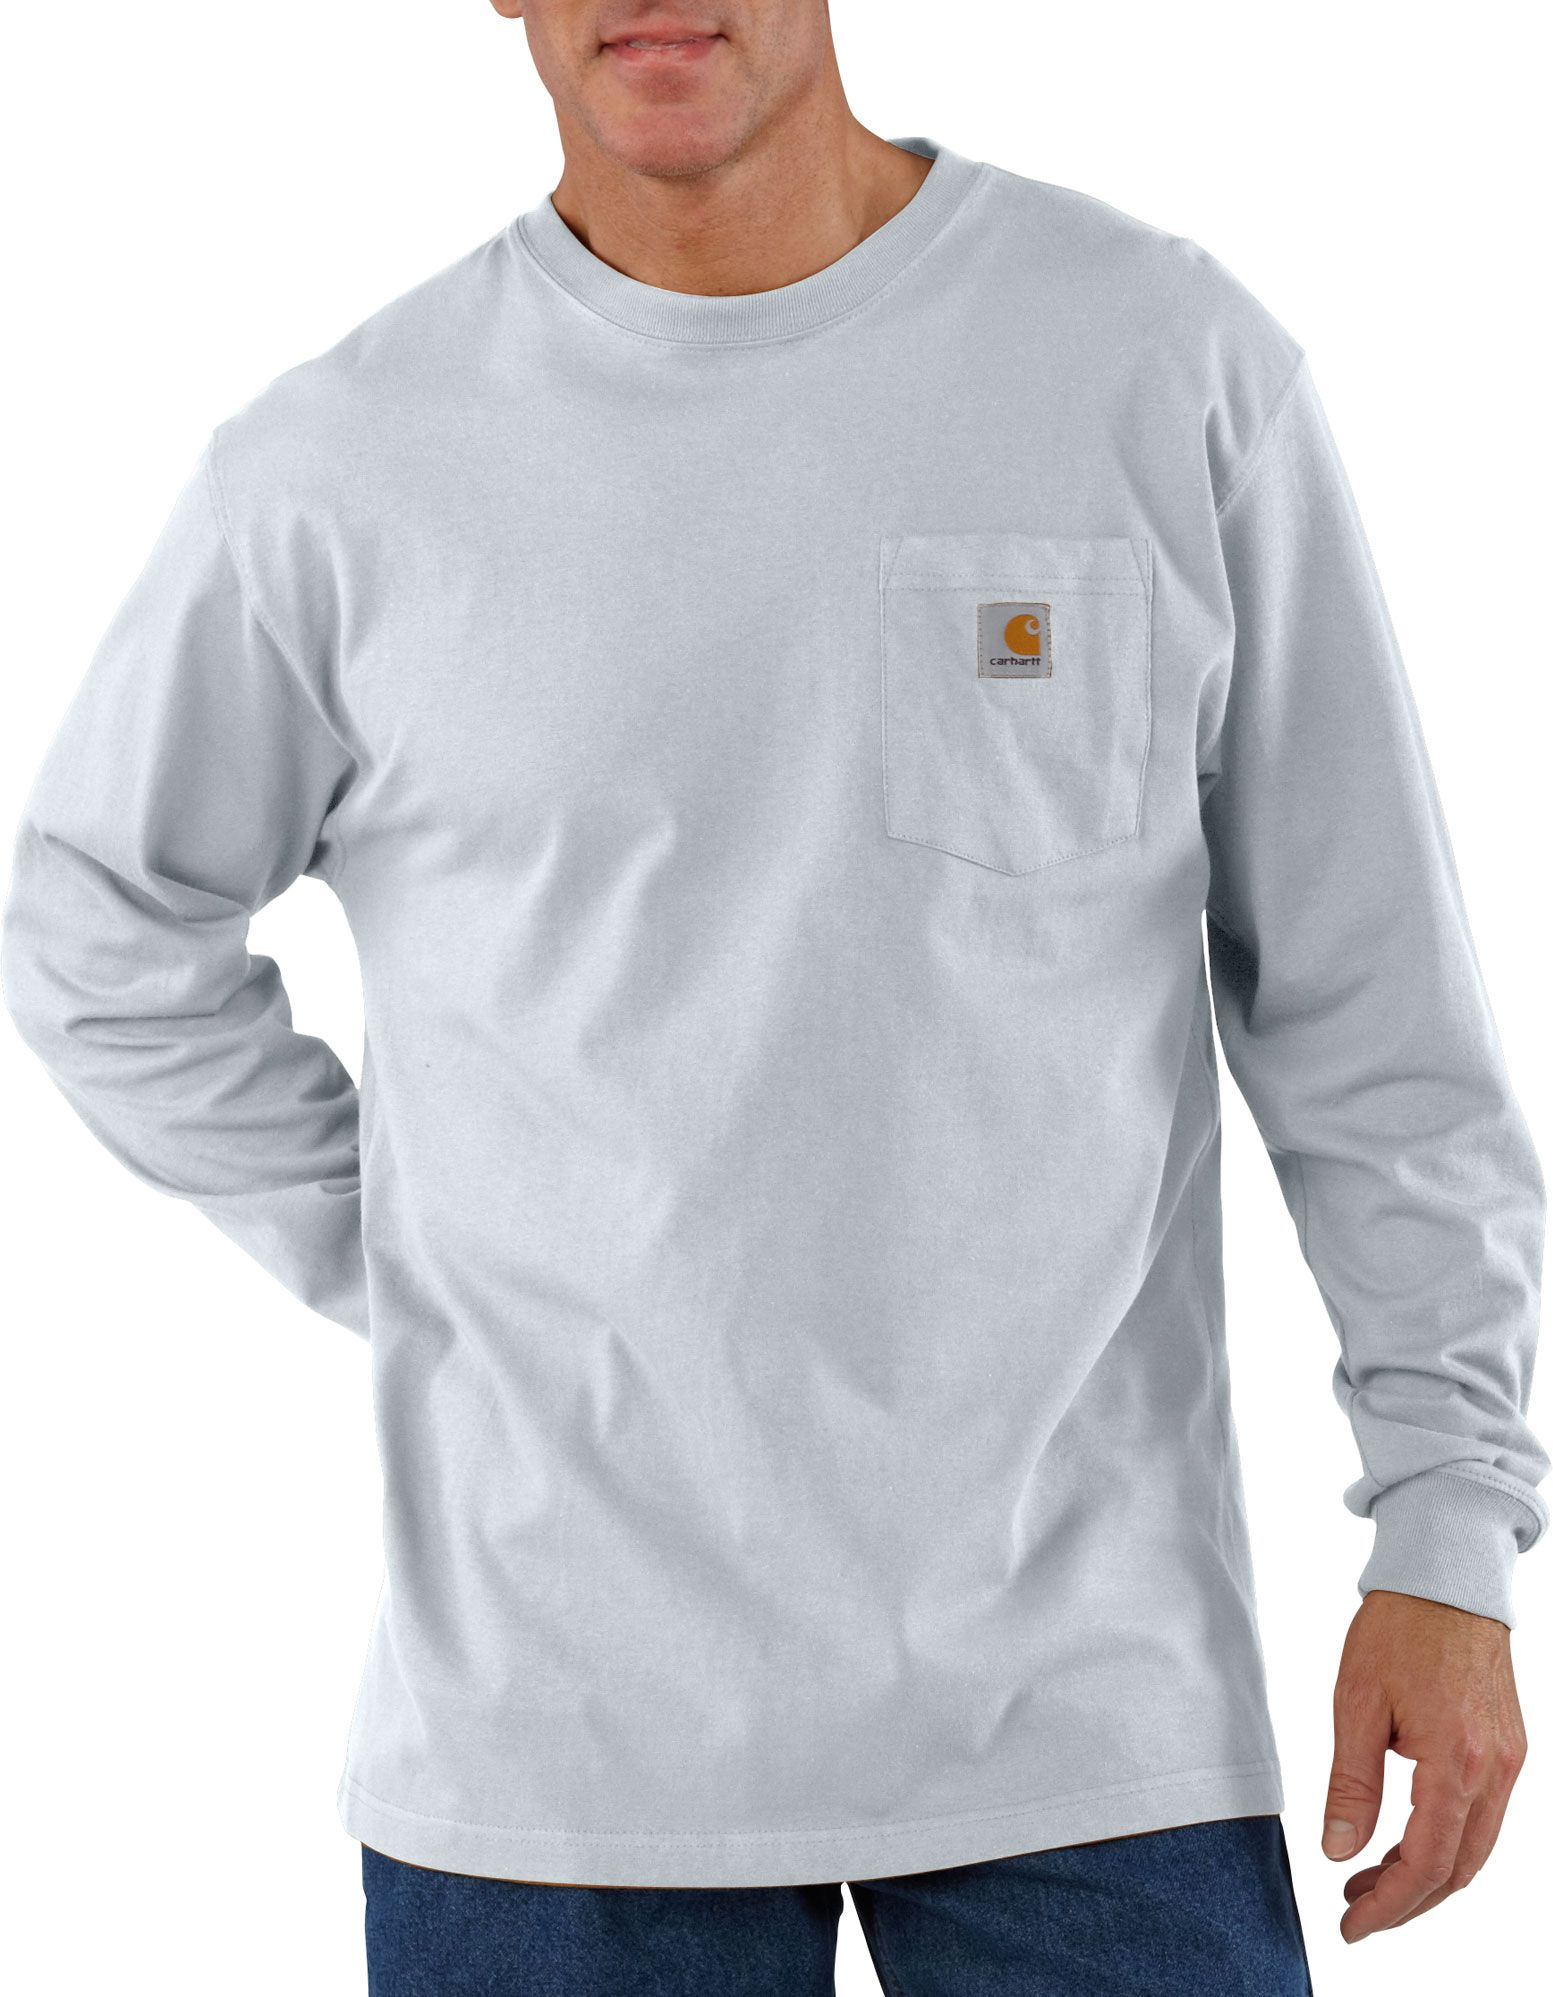 33de939b97ea Carhartt Men's Workwear Long Sleeve Shirt in 2019 | Products ...